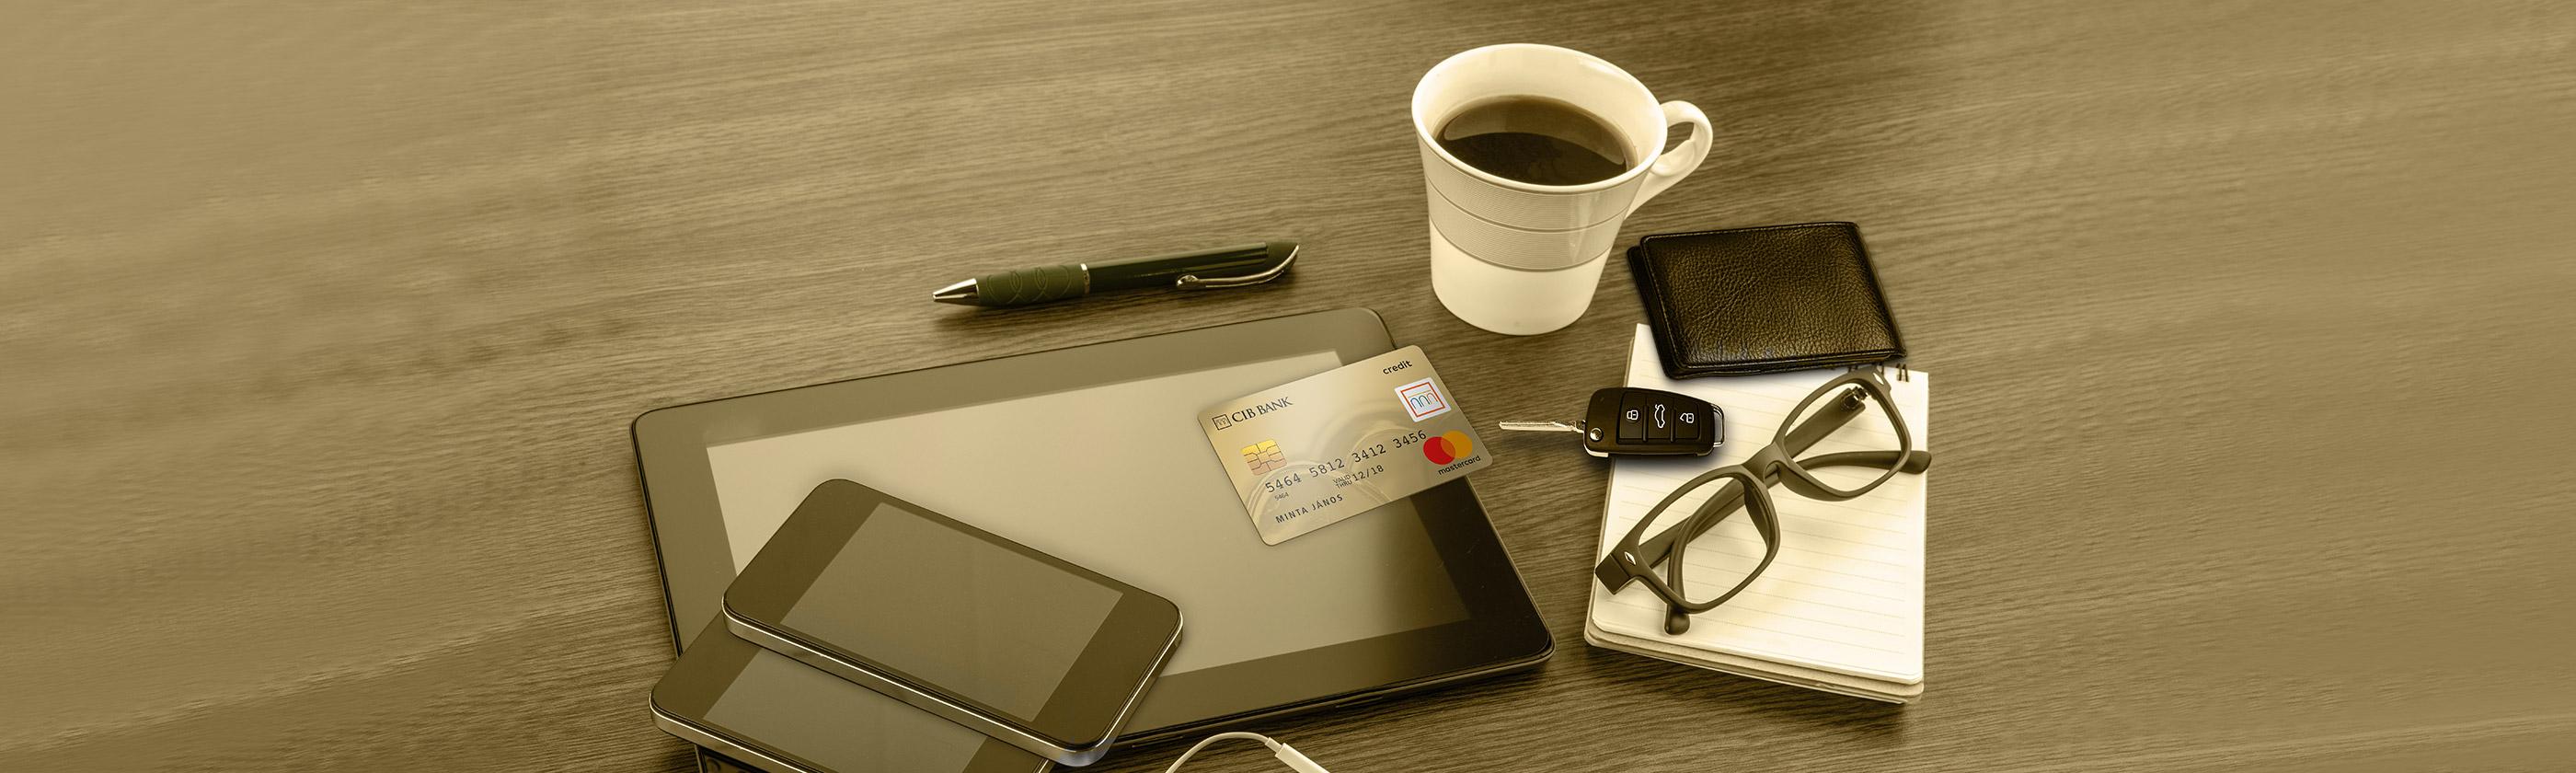 CIB Mastercard Gold Hitelkártya